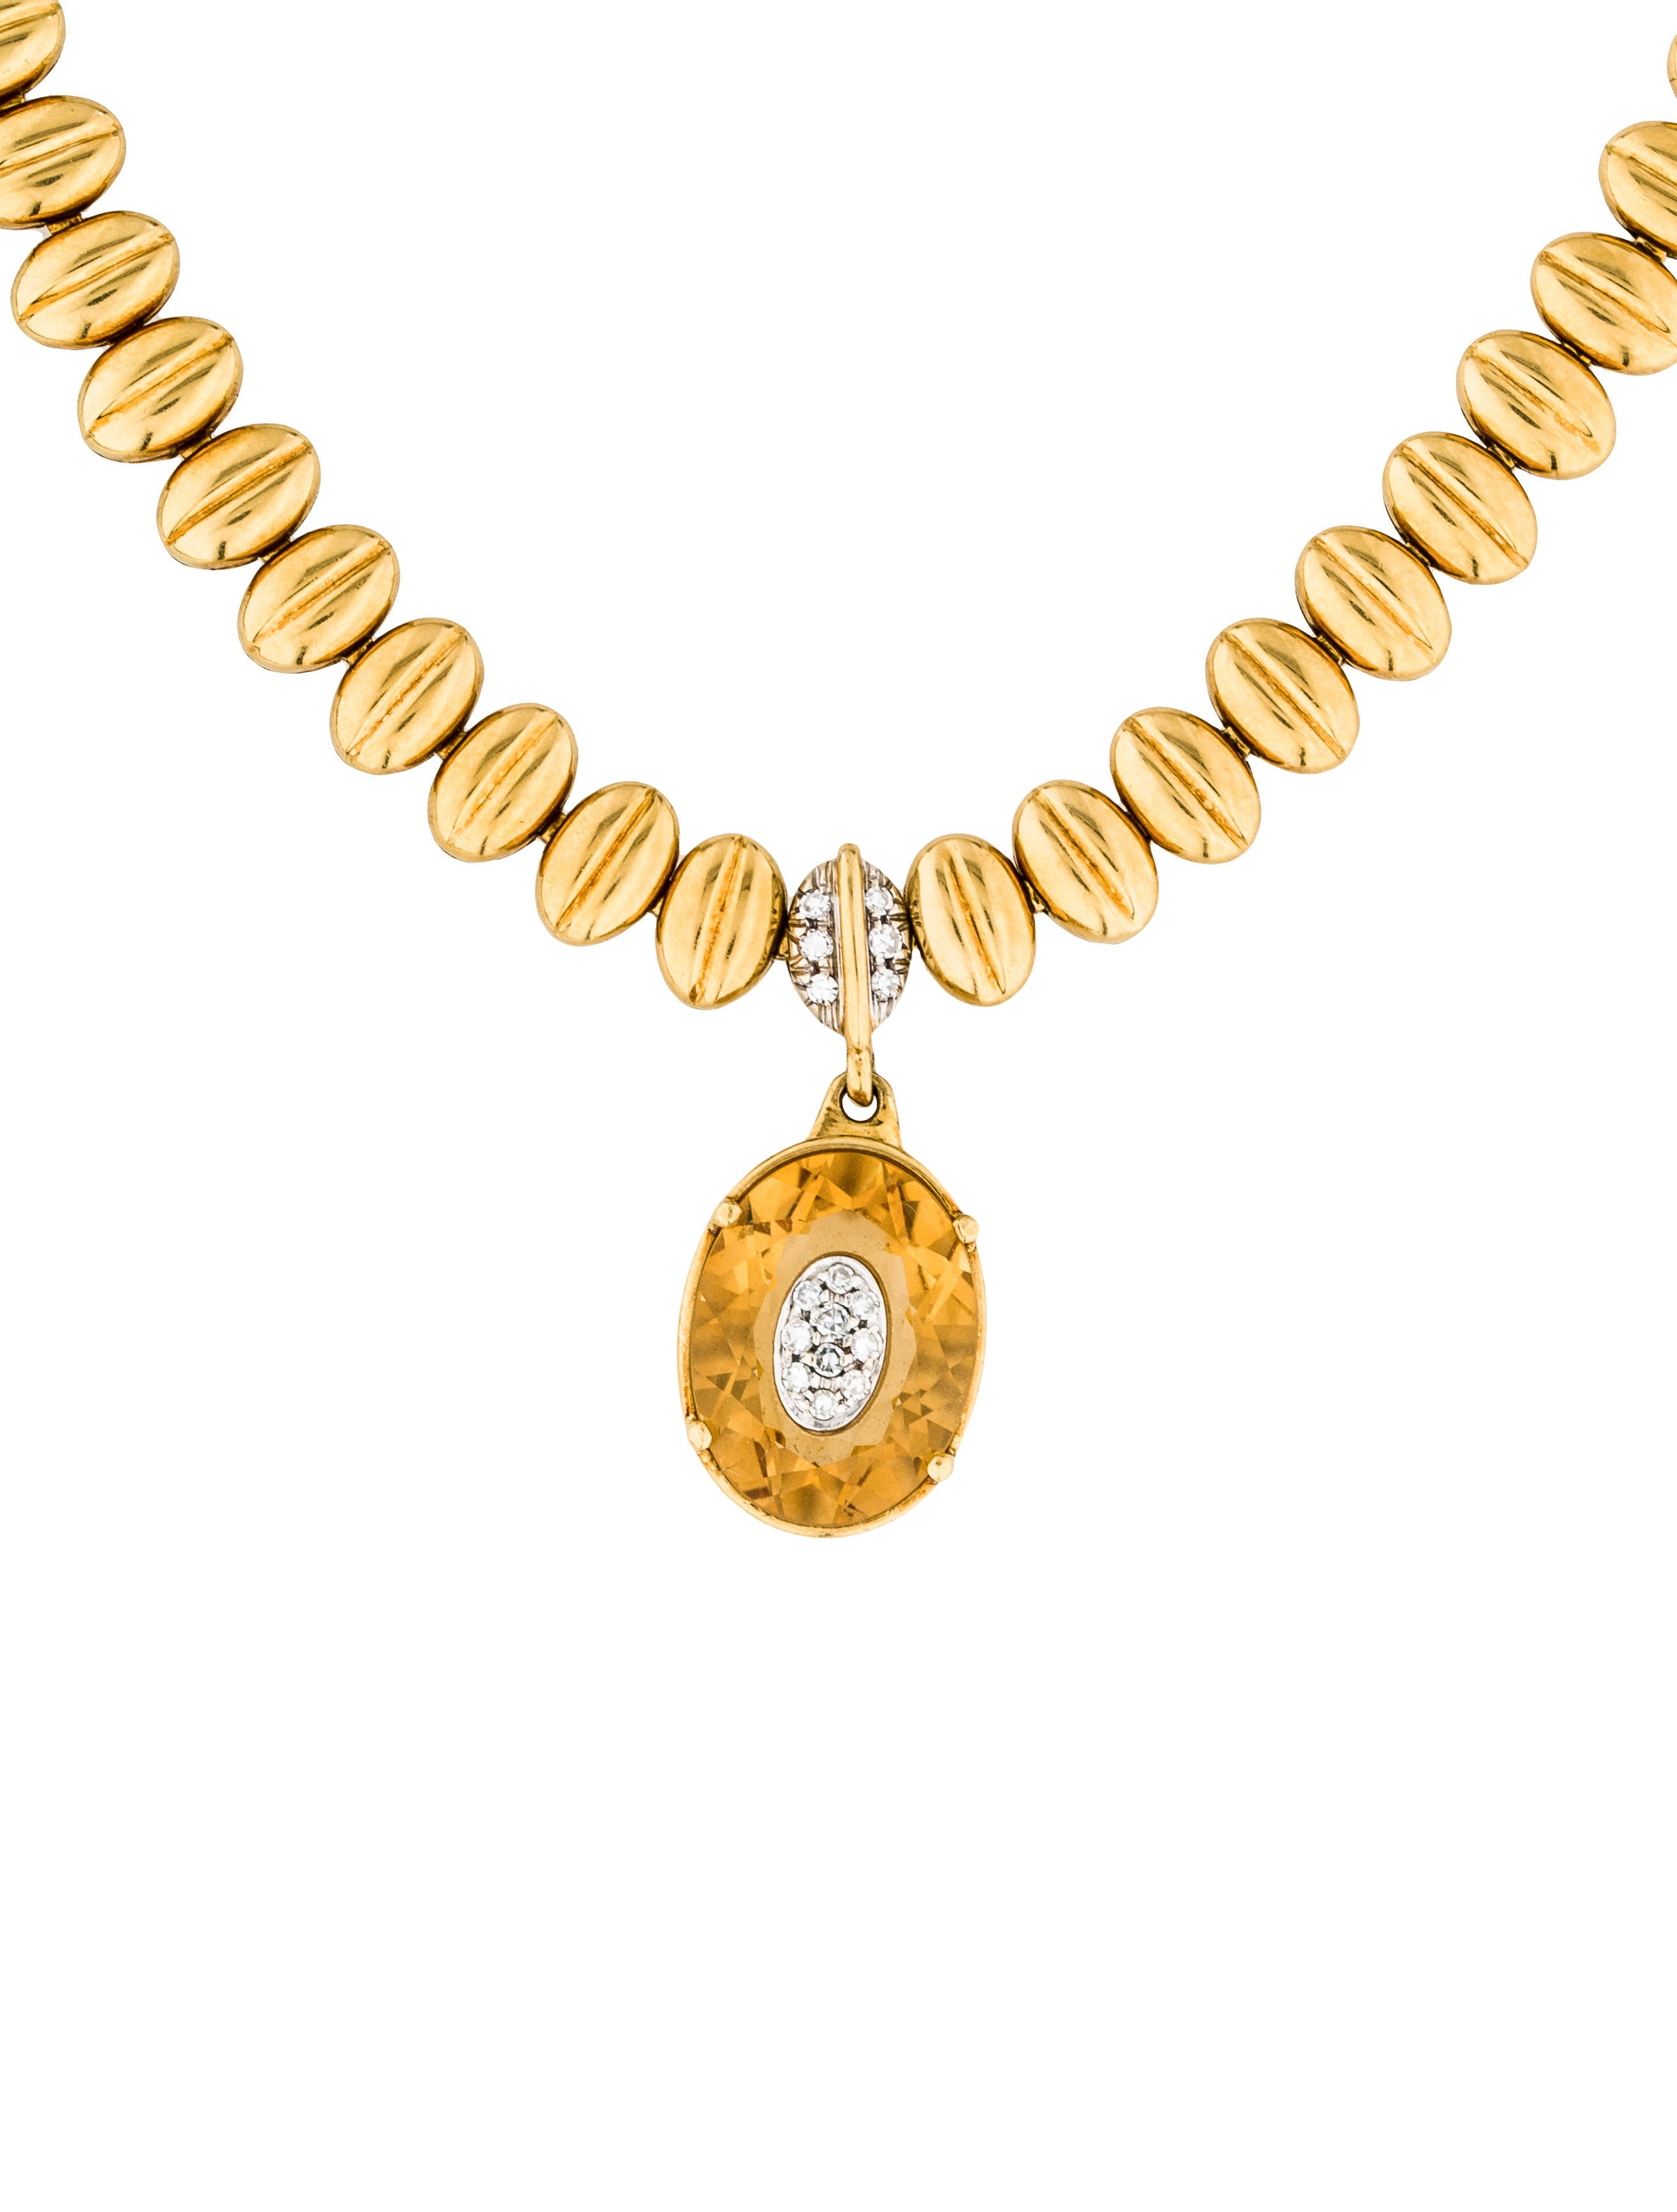 18k citrine amp diamond necklace necklaces neckl27244